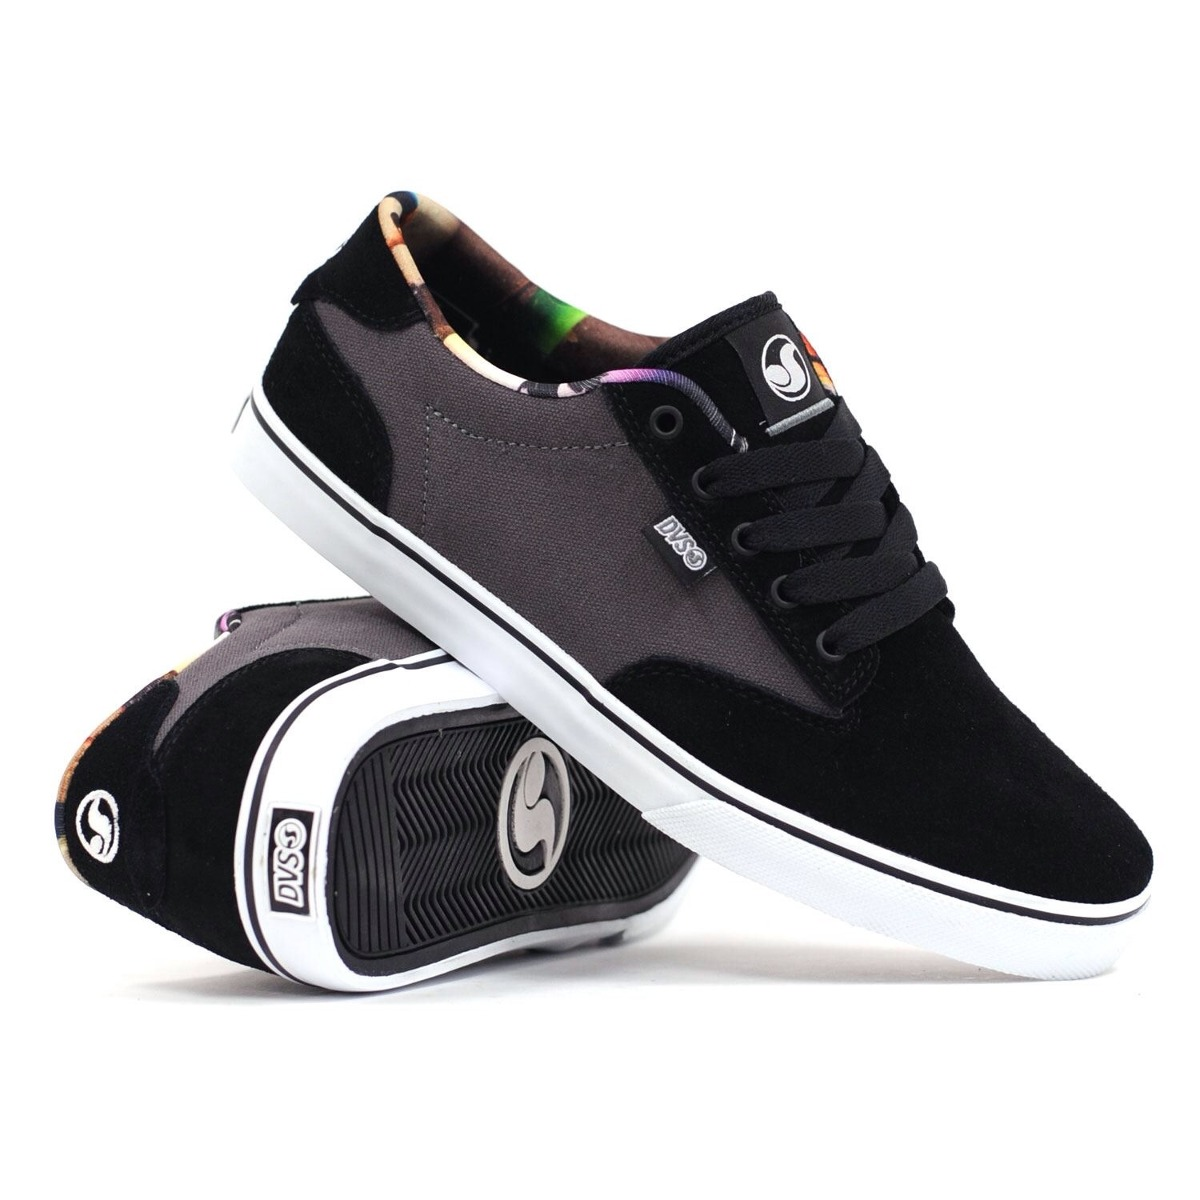 Supra Tennis Shoes